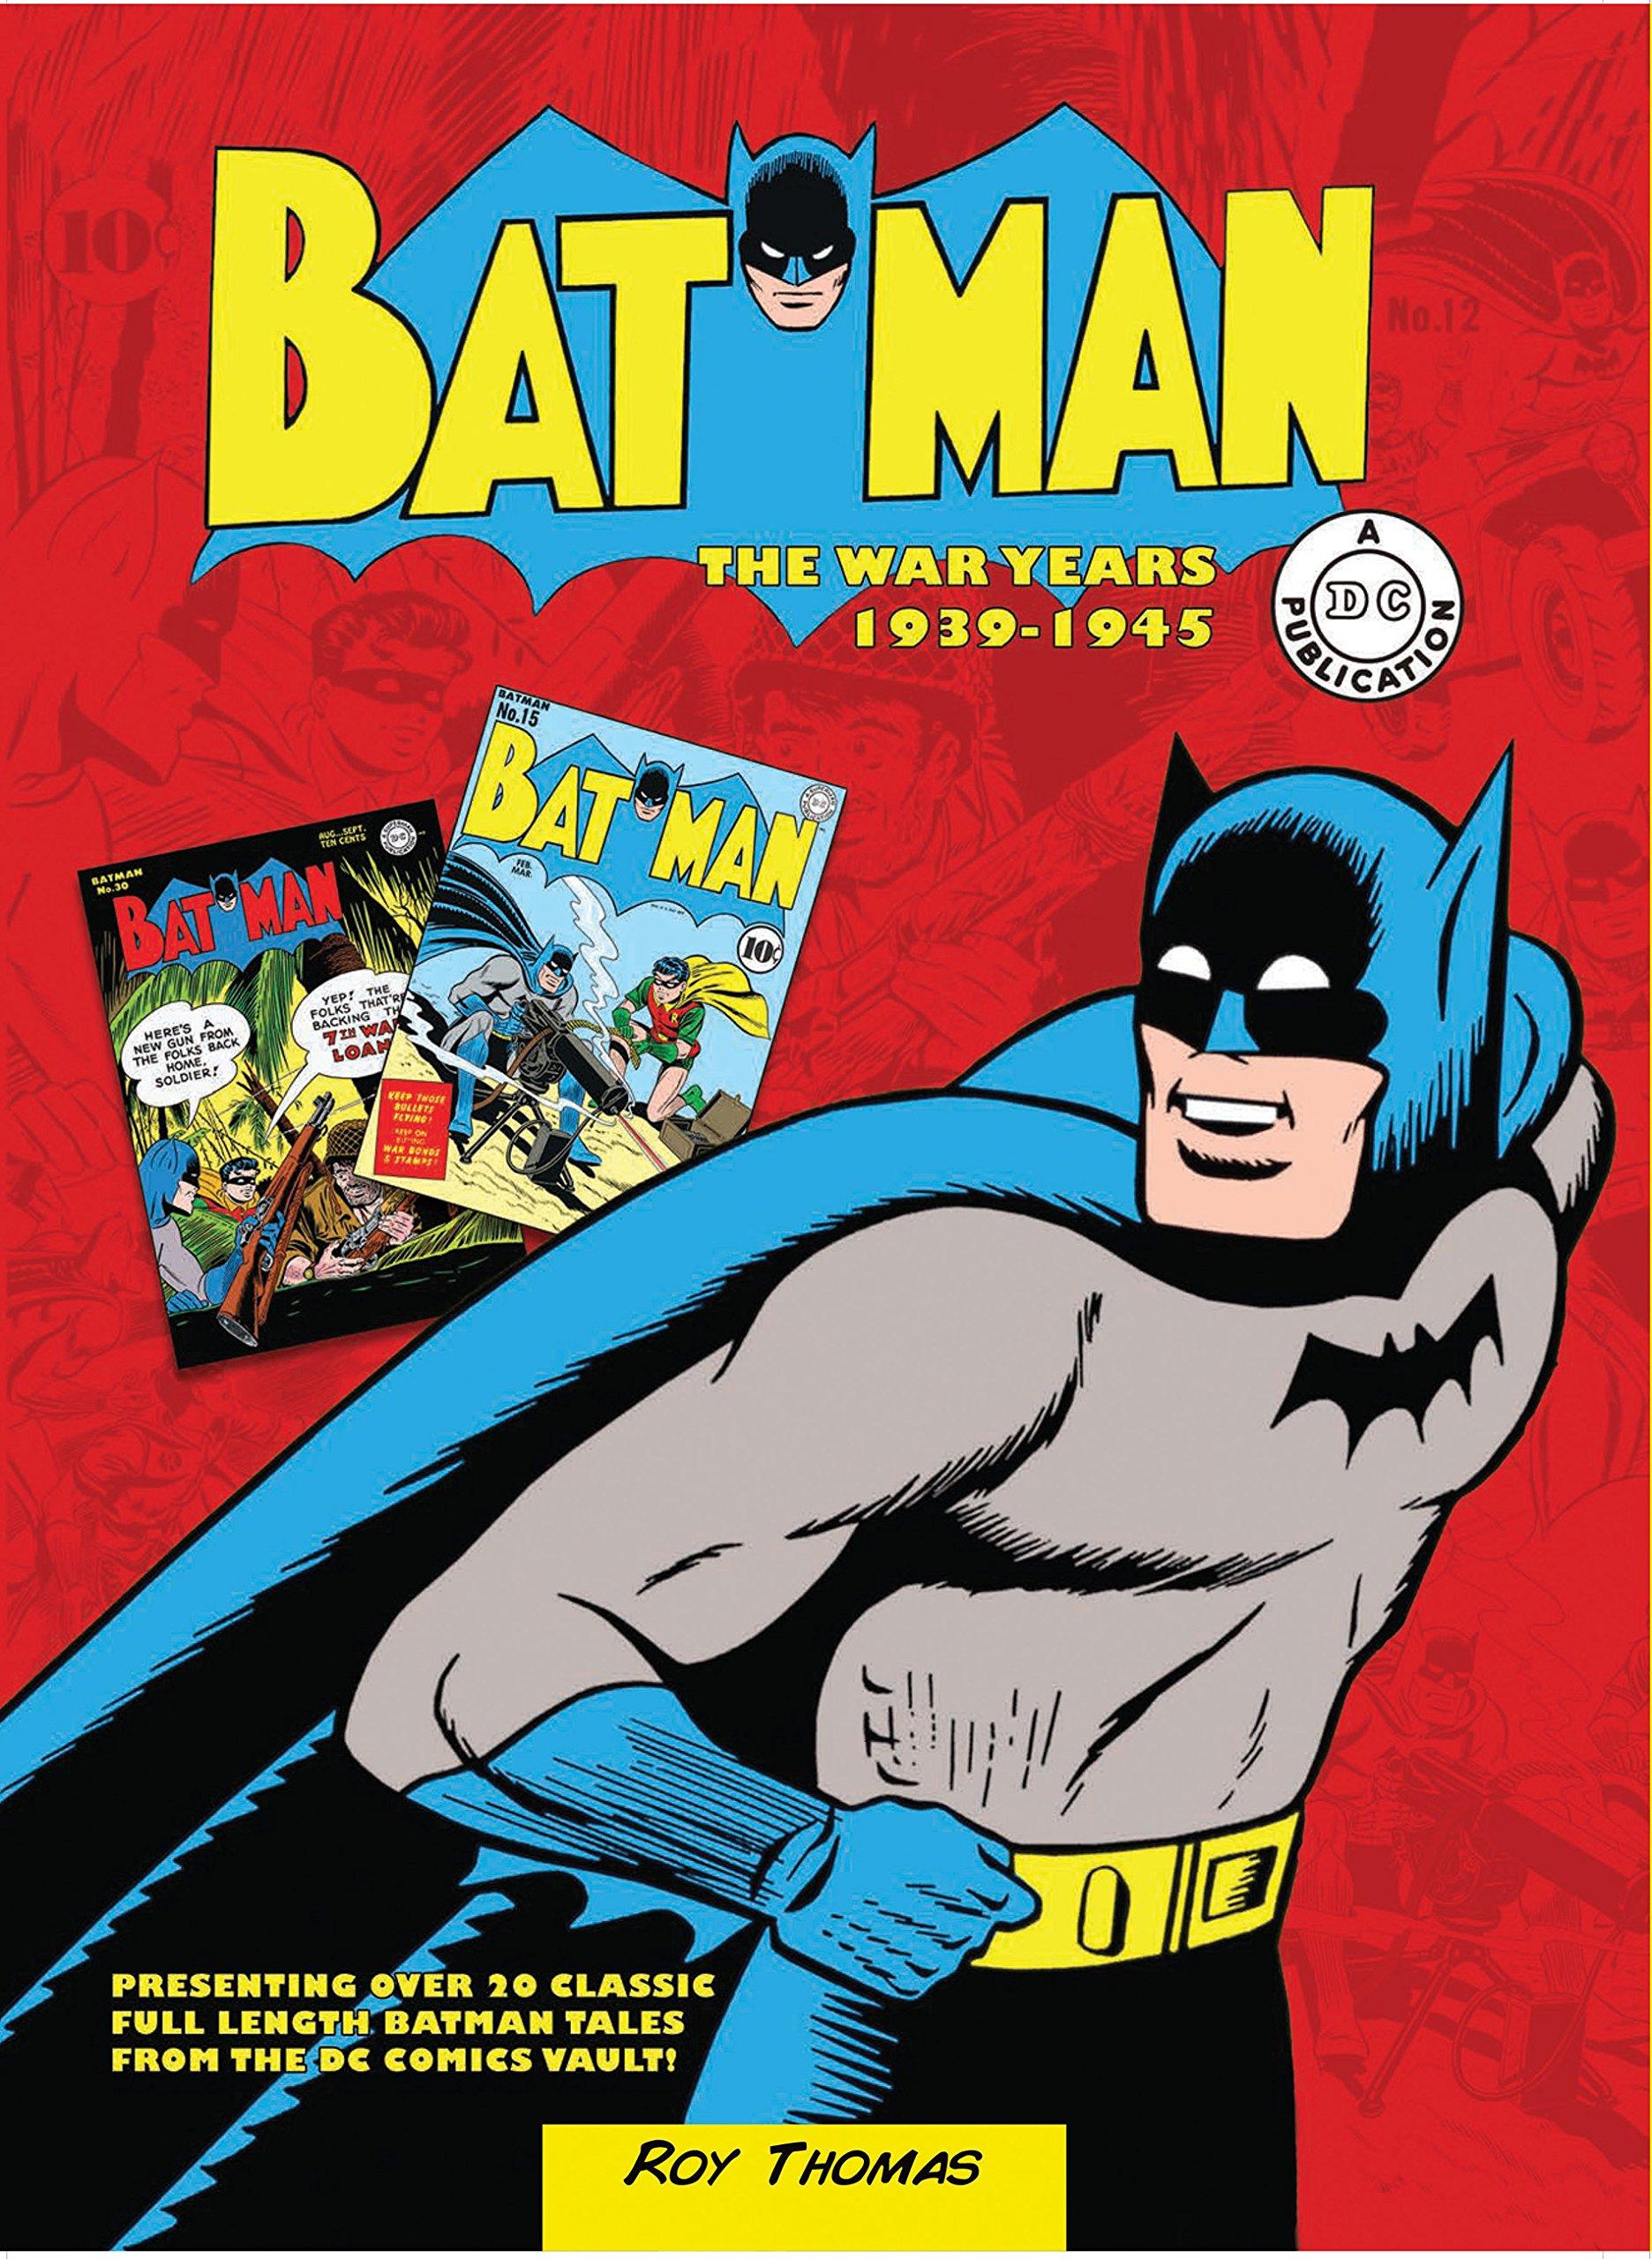 Batman The War Years 1939 1945 Presenting Over 20 Classic Full